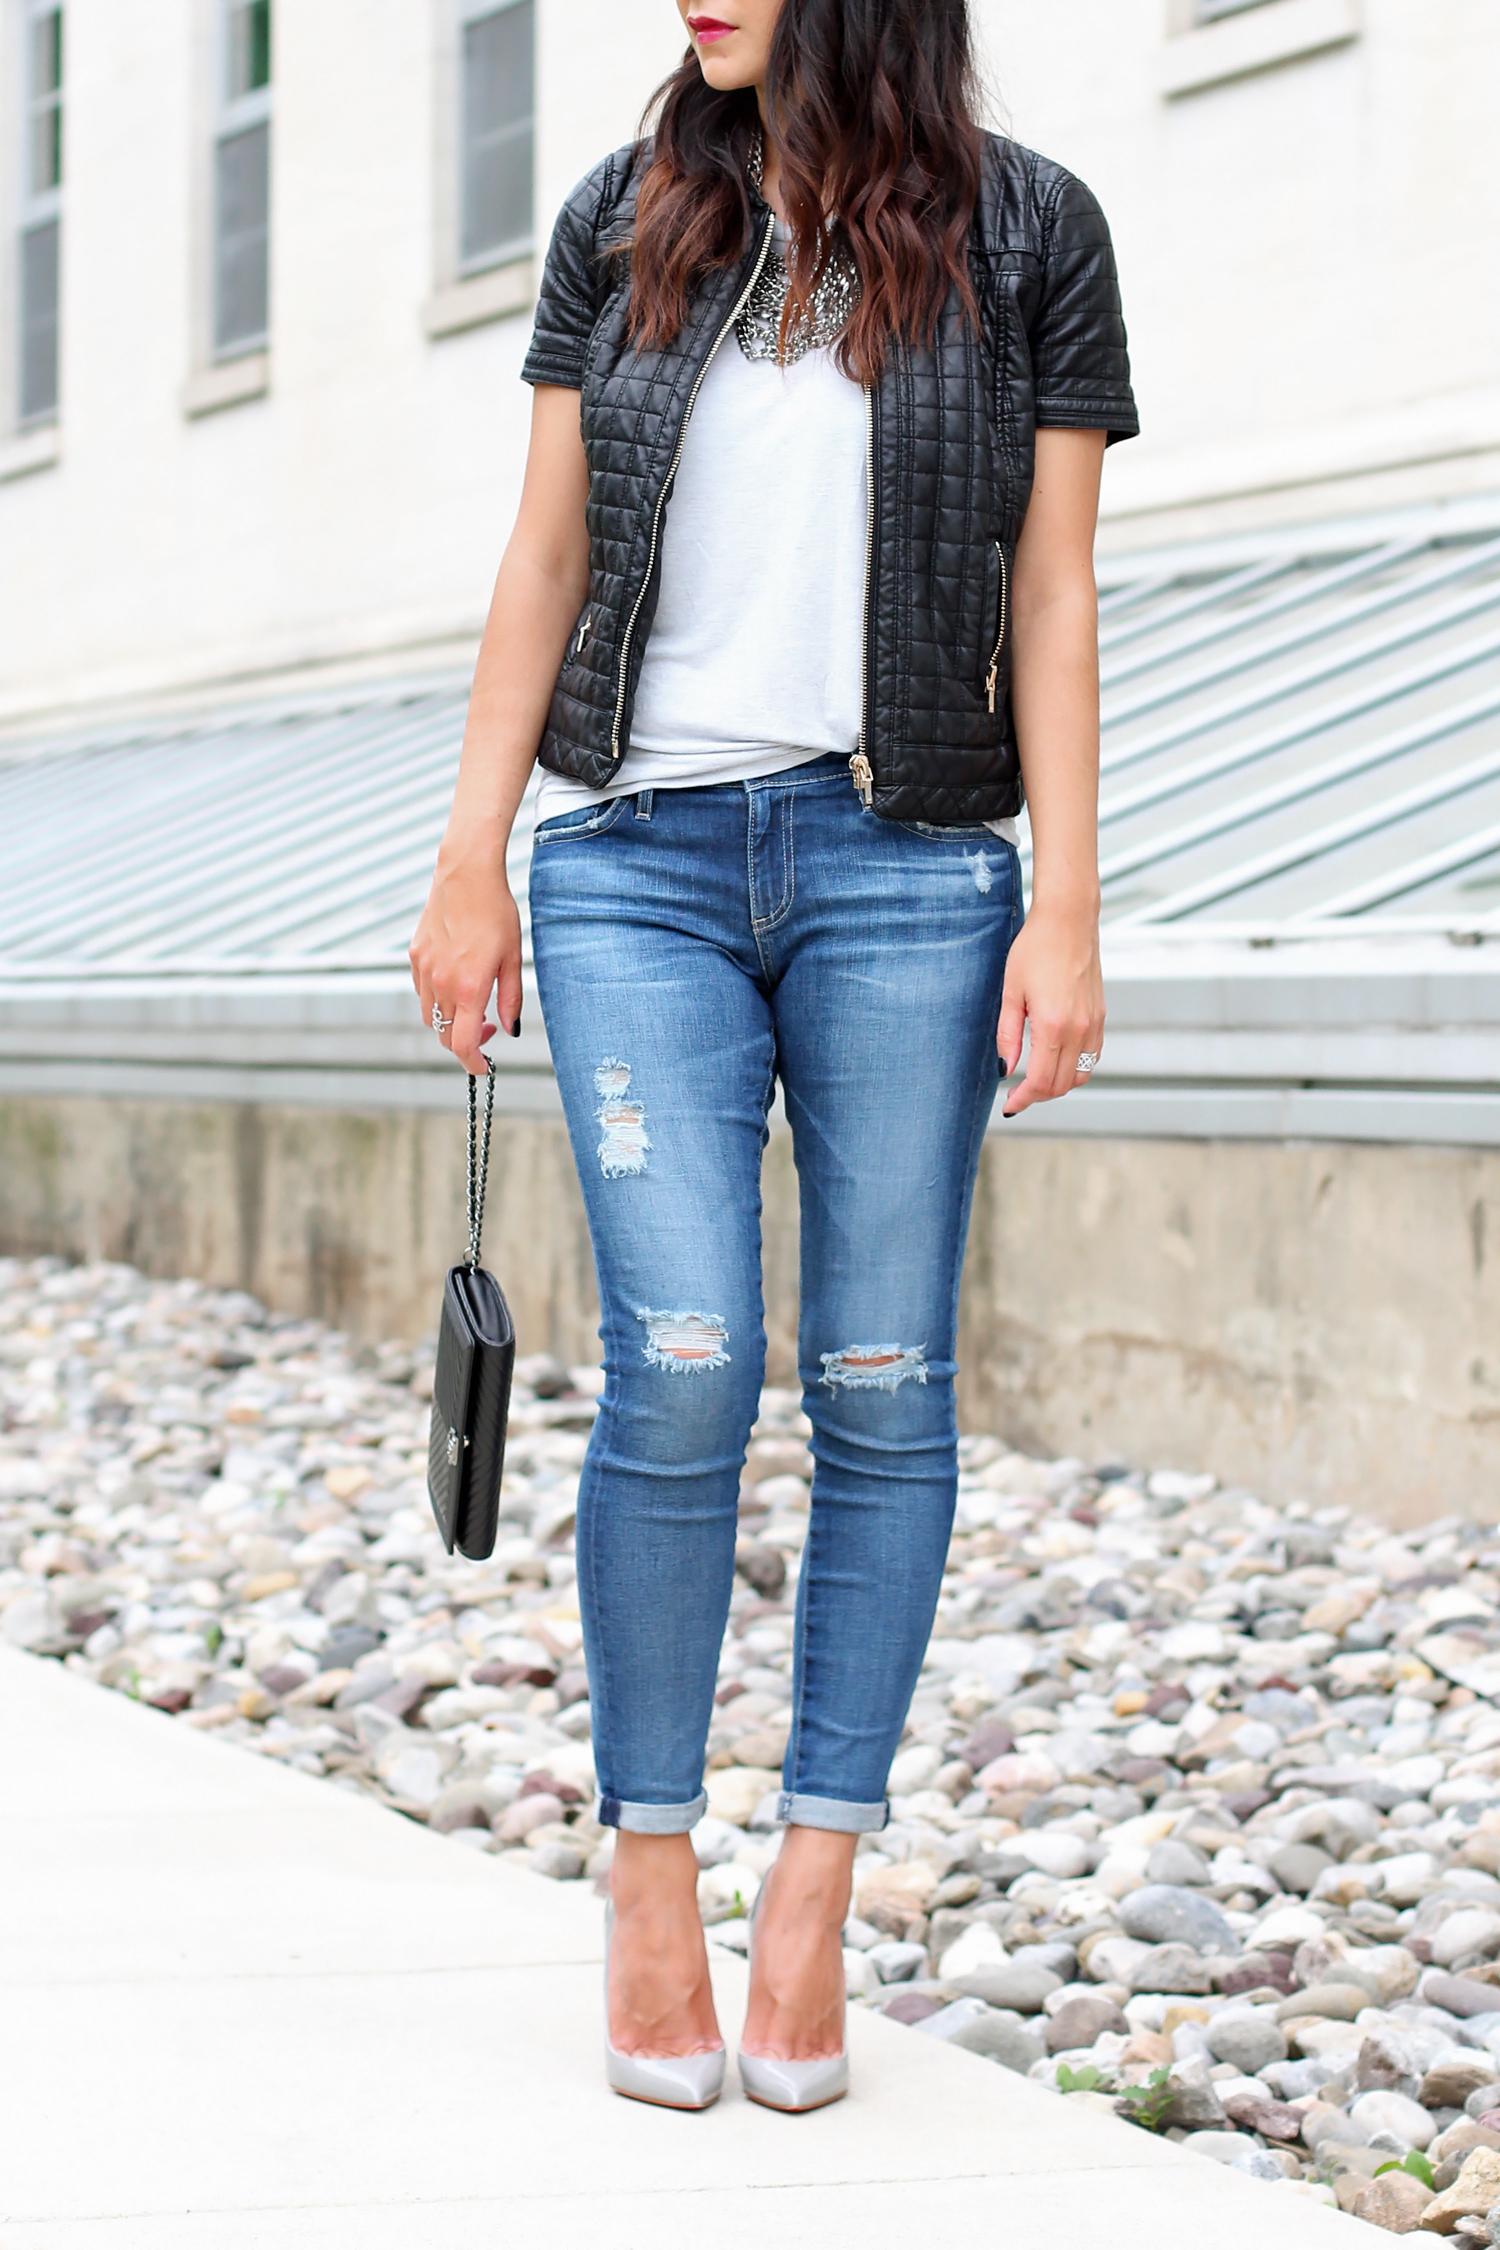 AG Jeans 11 Year Swap Meet